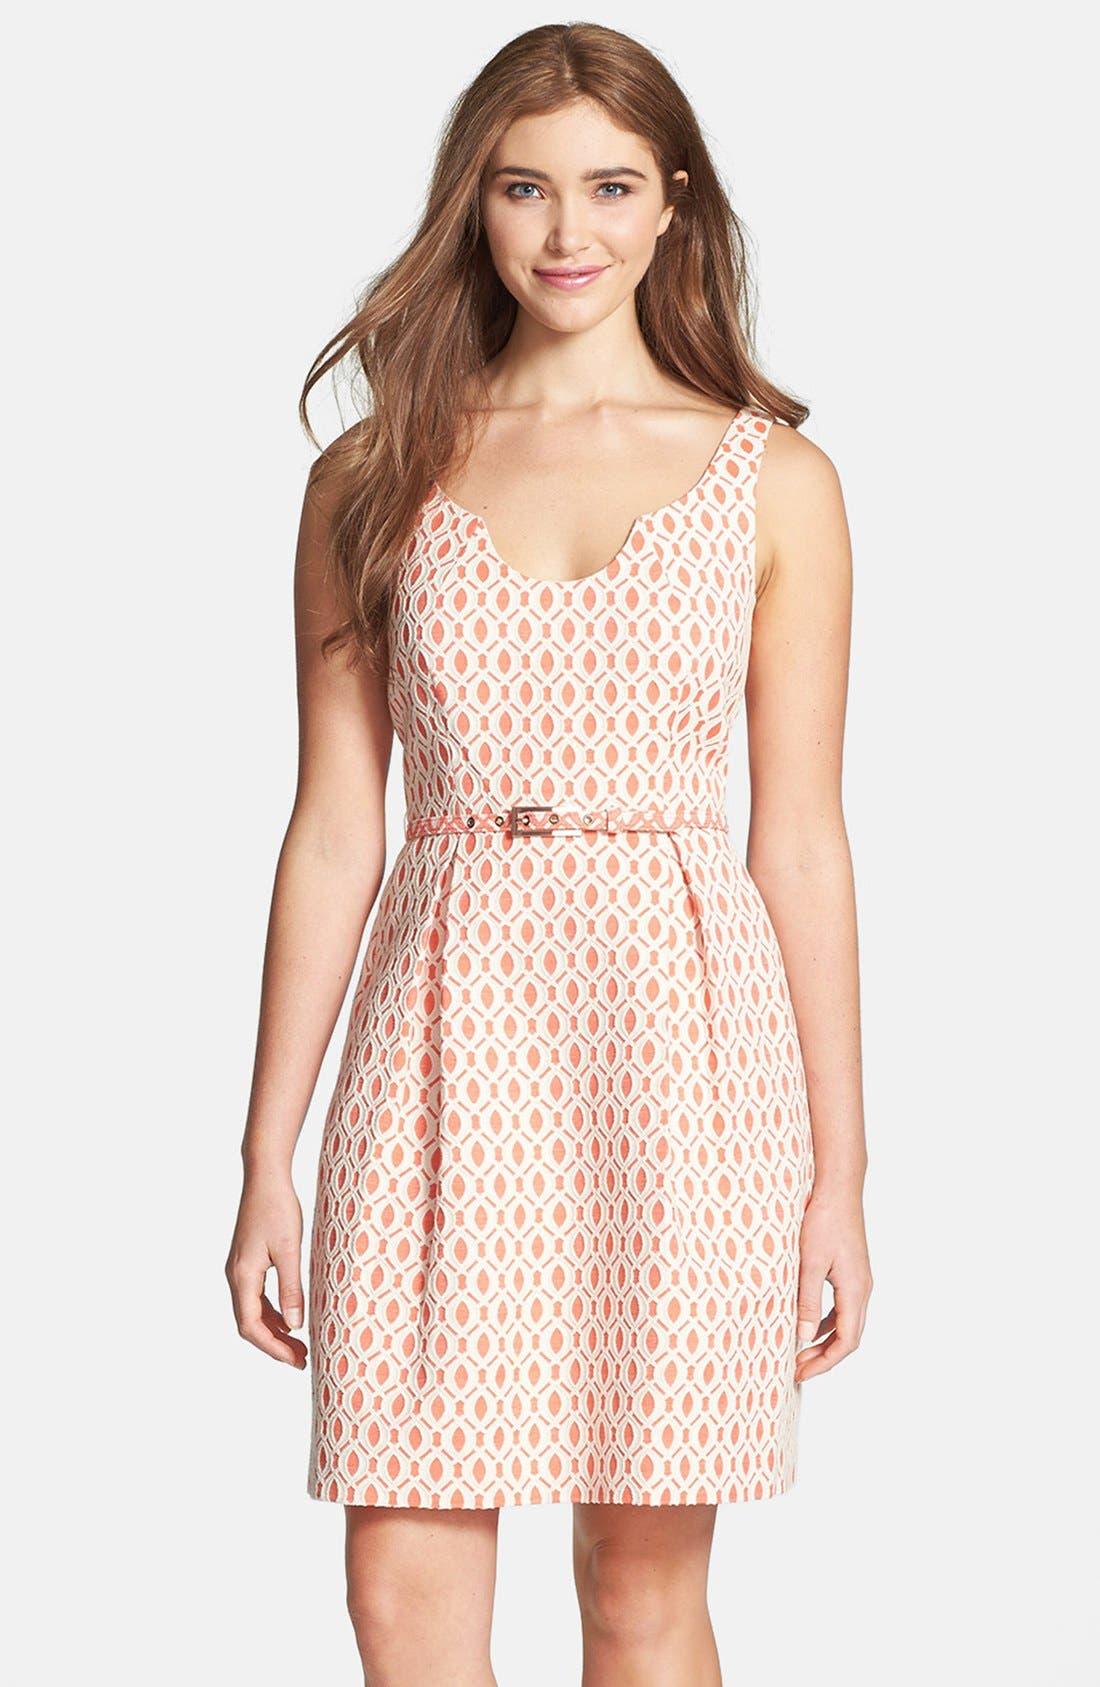 Alternate Image 1 Selected - Trina Turk 'Solage' Jacquard Fit & Flare Dress